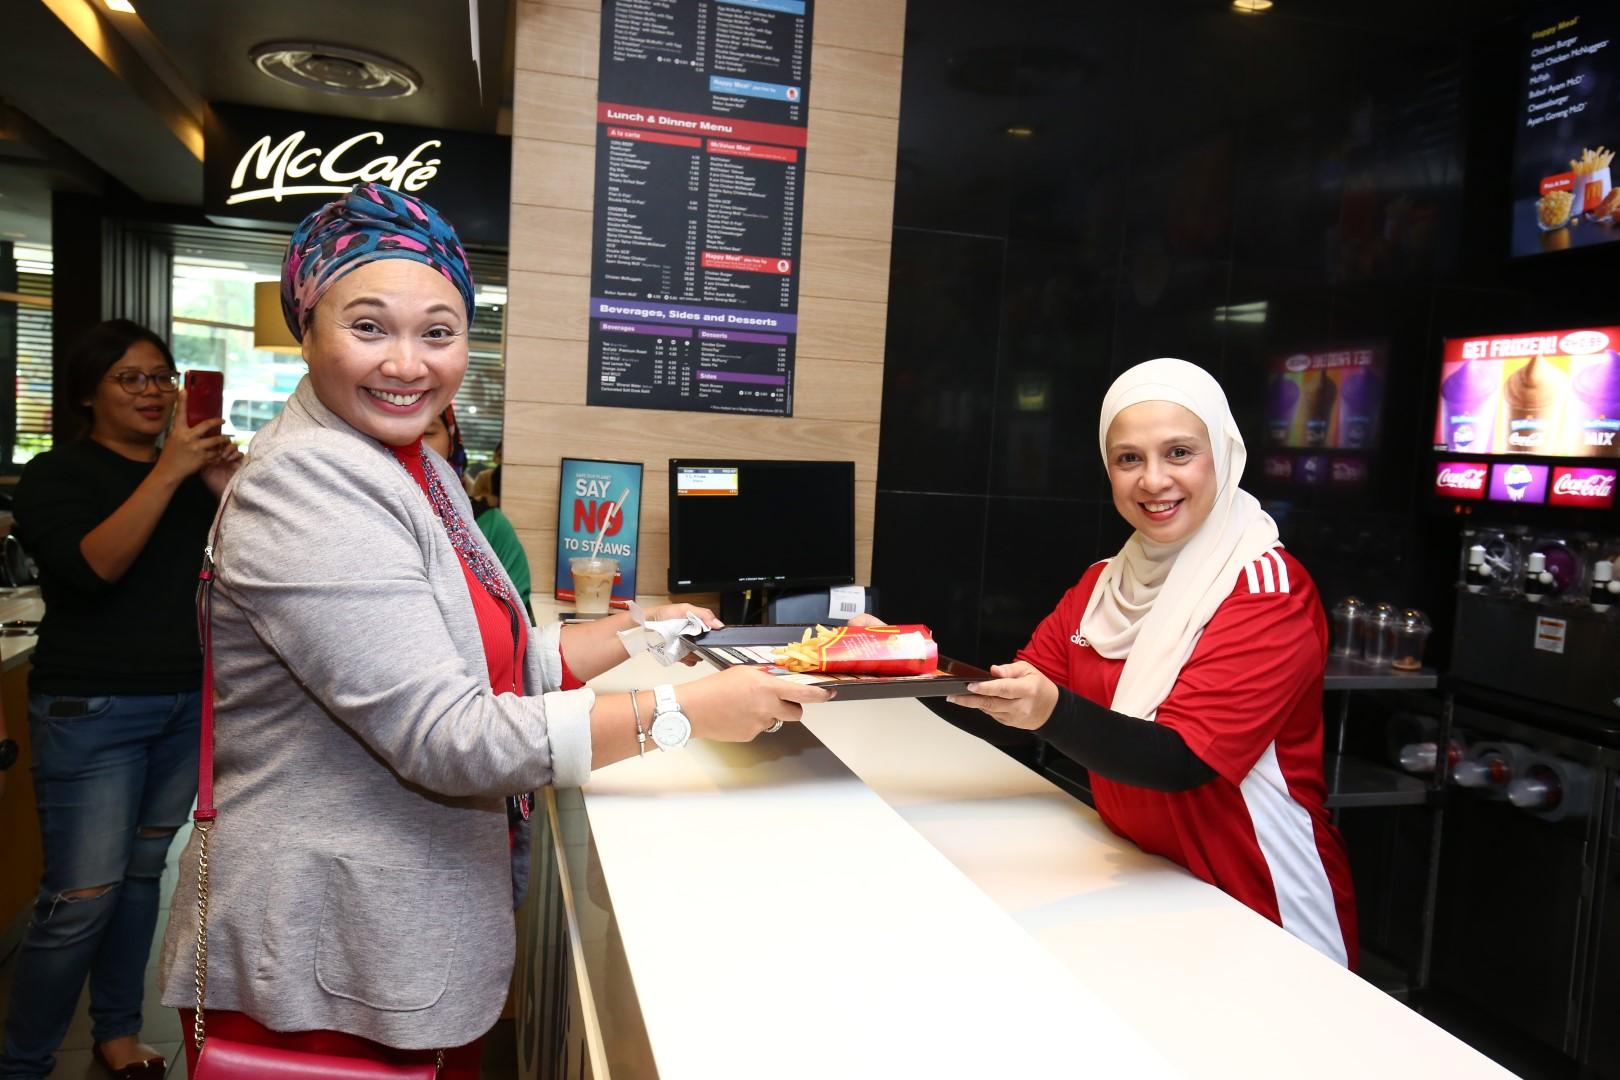 Chief Marketing Officer of McDonald's Malaysia, Melati Abdul Hai handing over an order to a happy customer